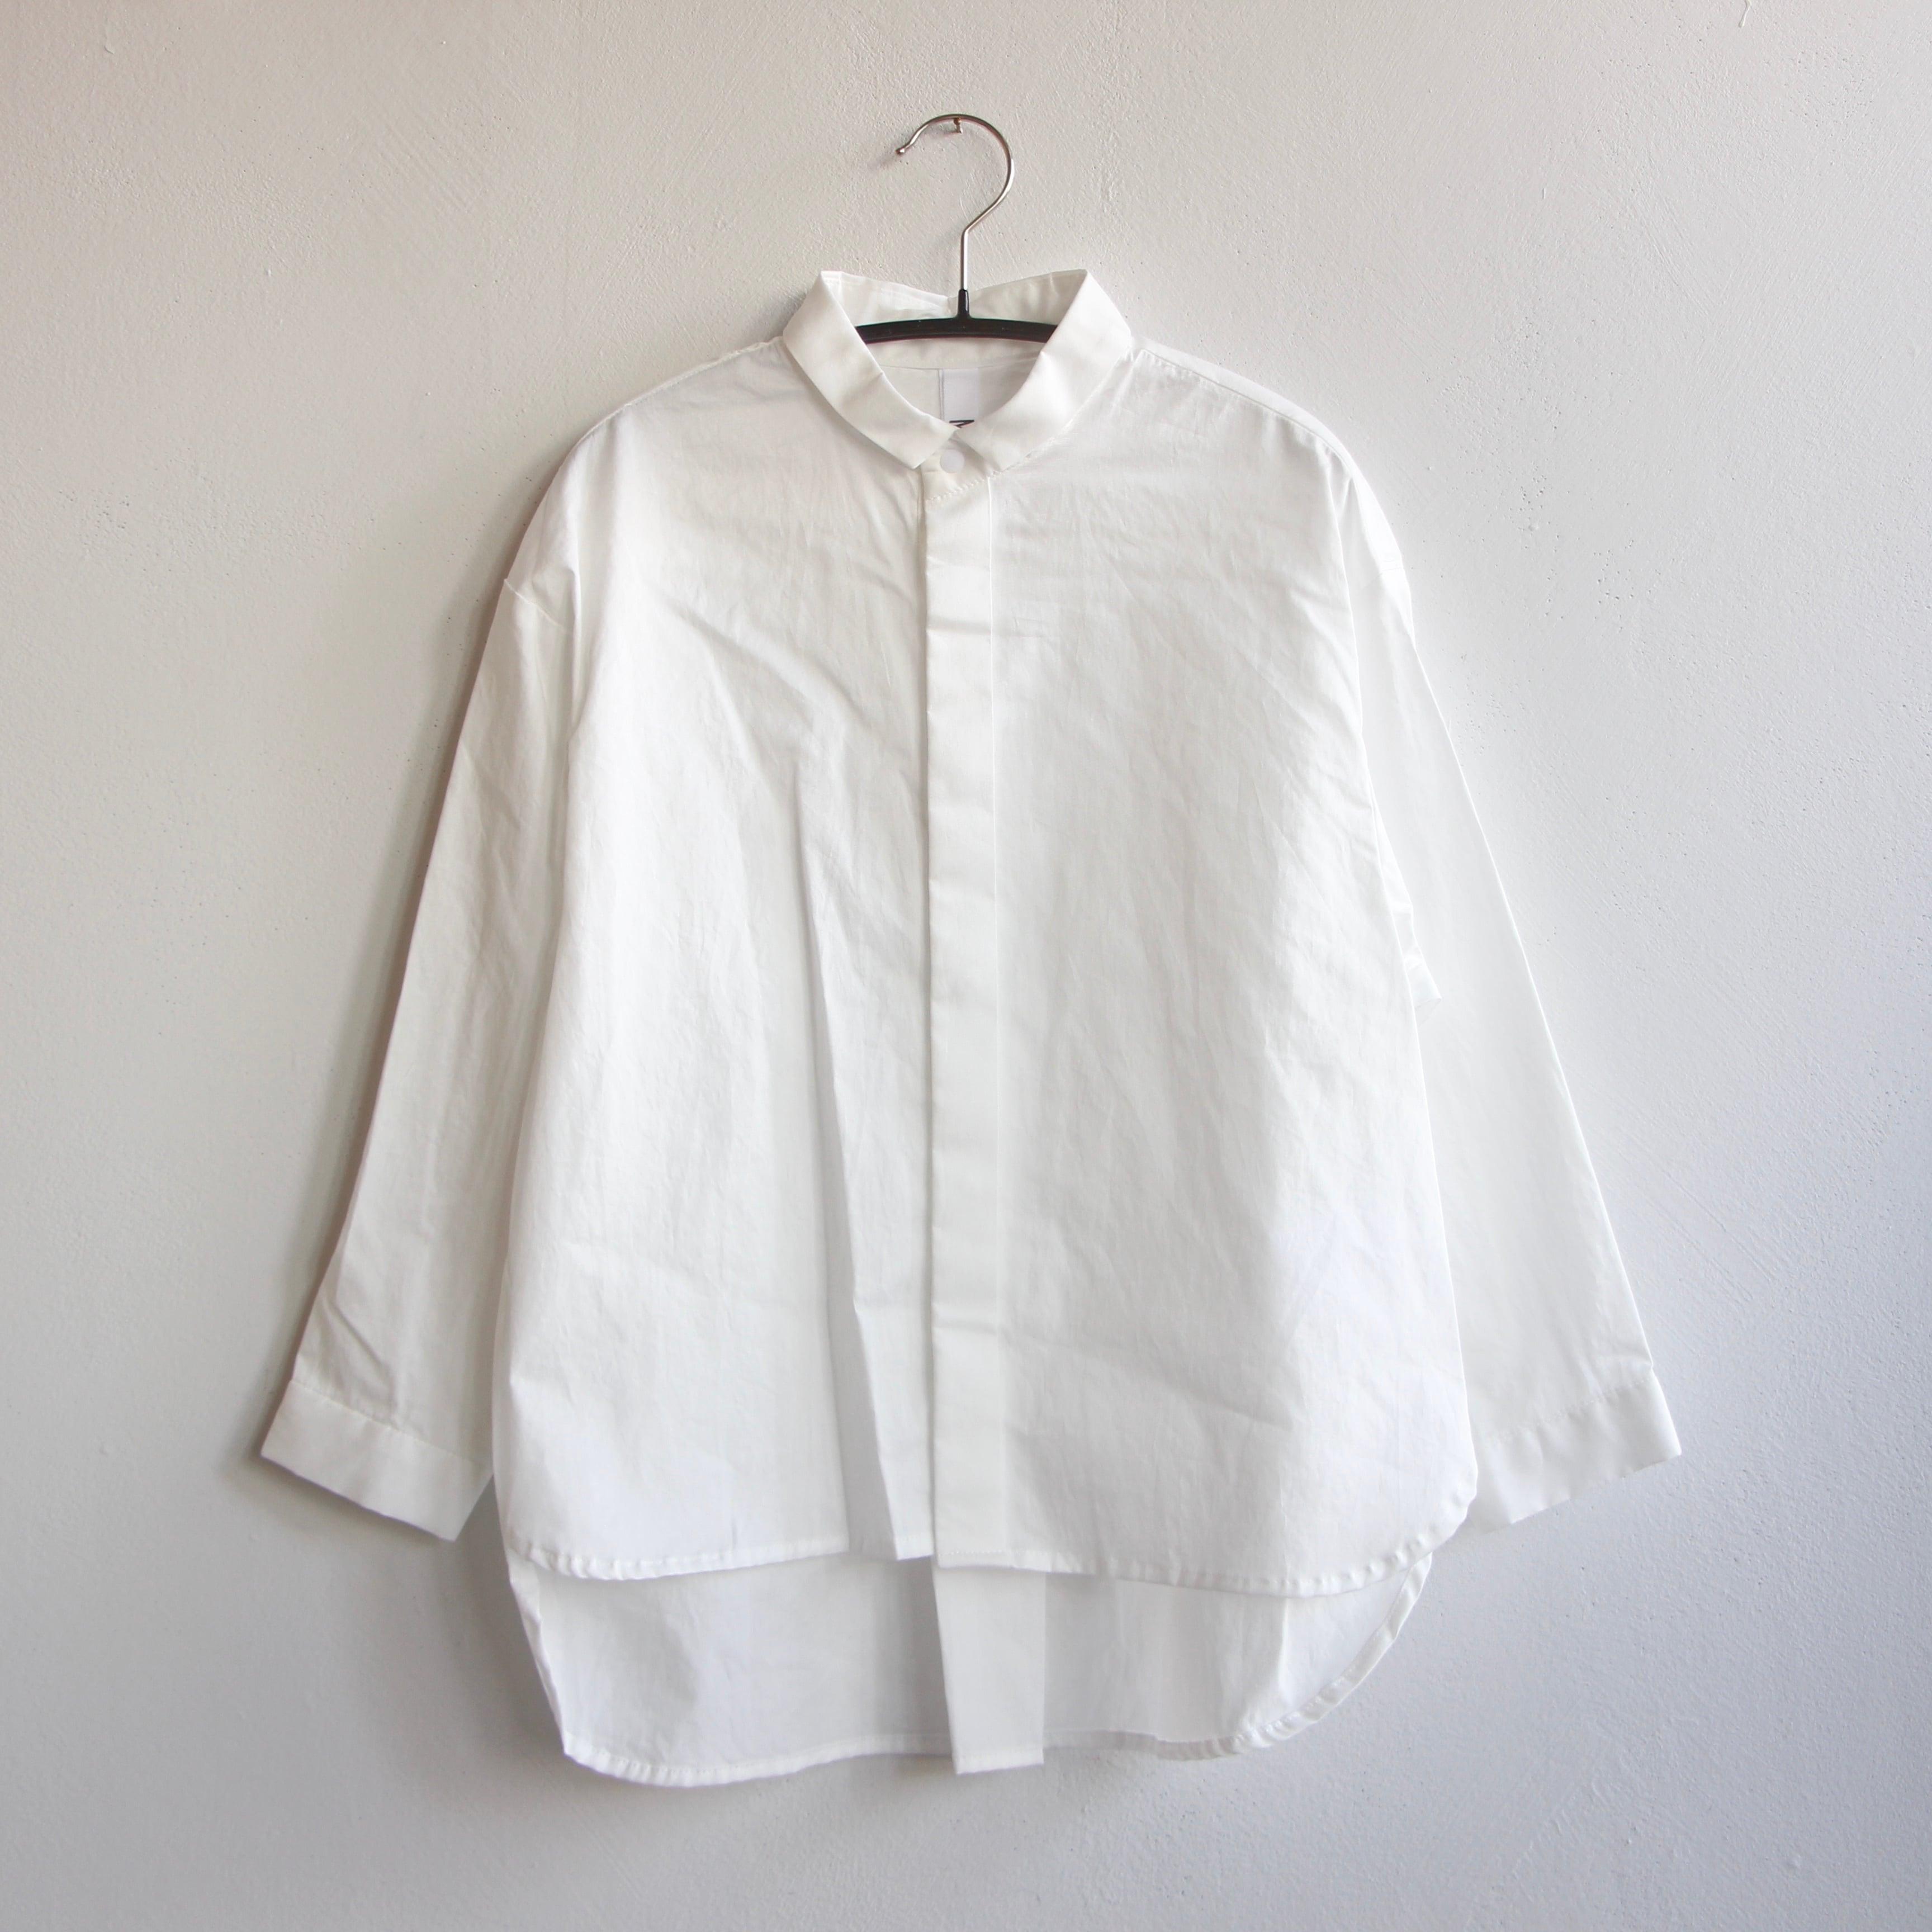 《MOUNTEN. 2021AW》80/1 washer big shirts / white / size1(155-165cm程度)